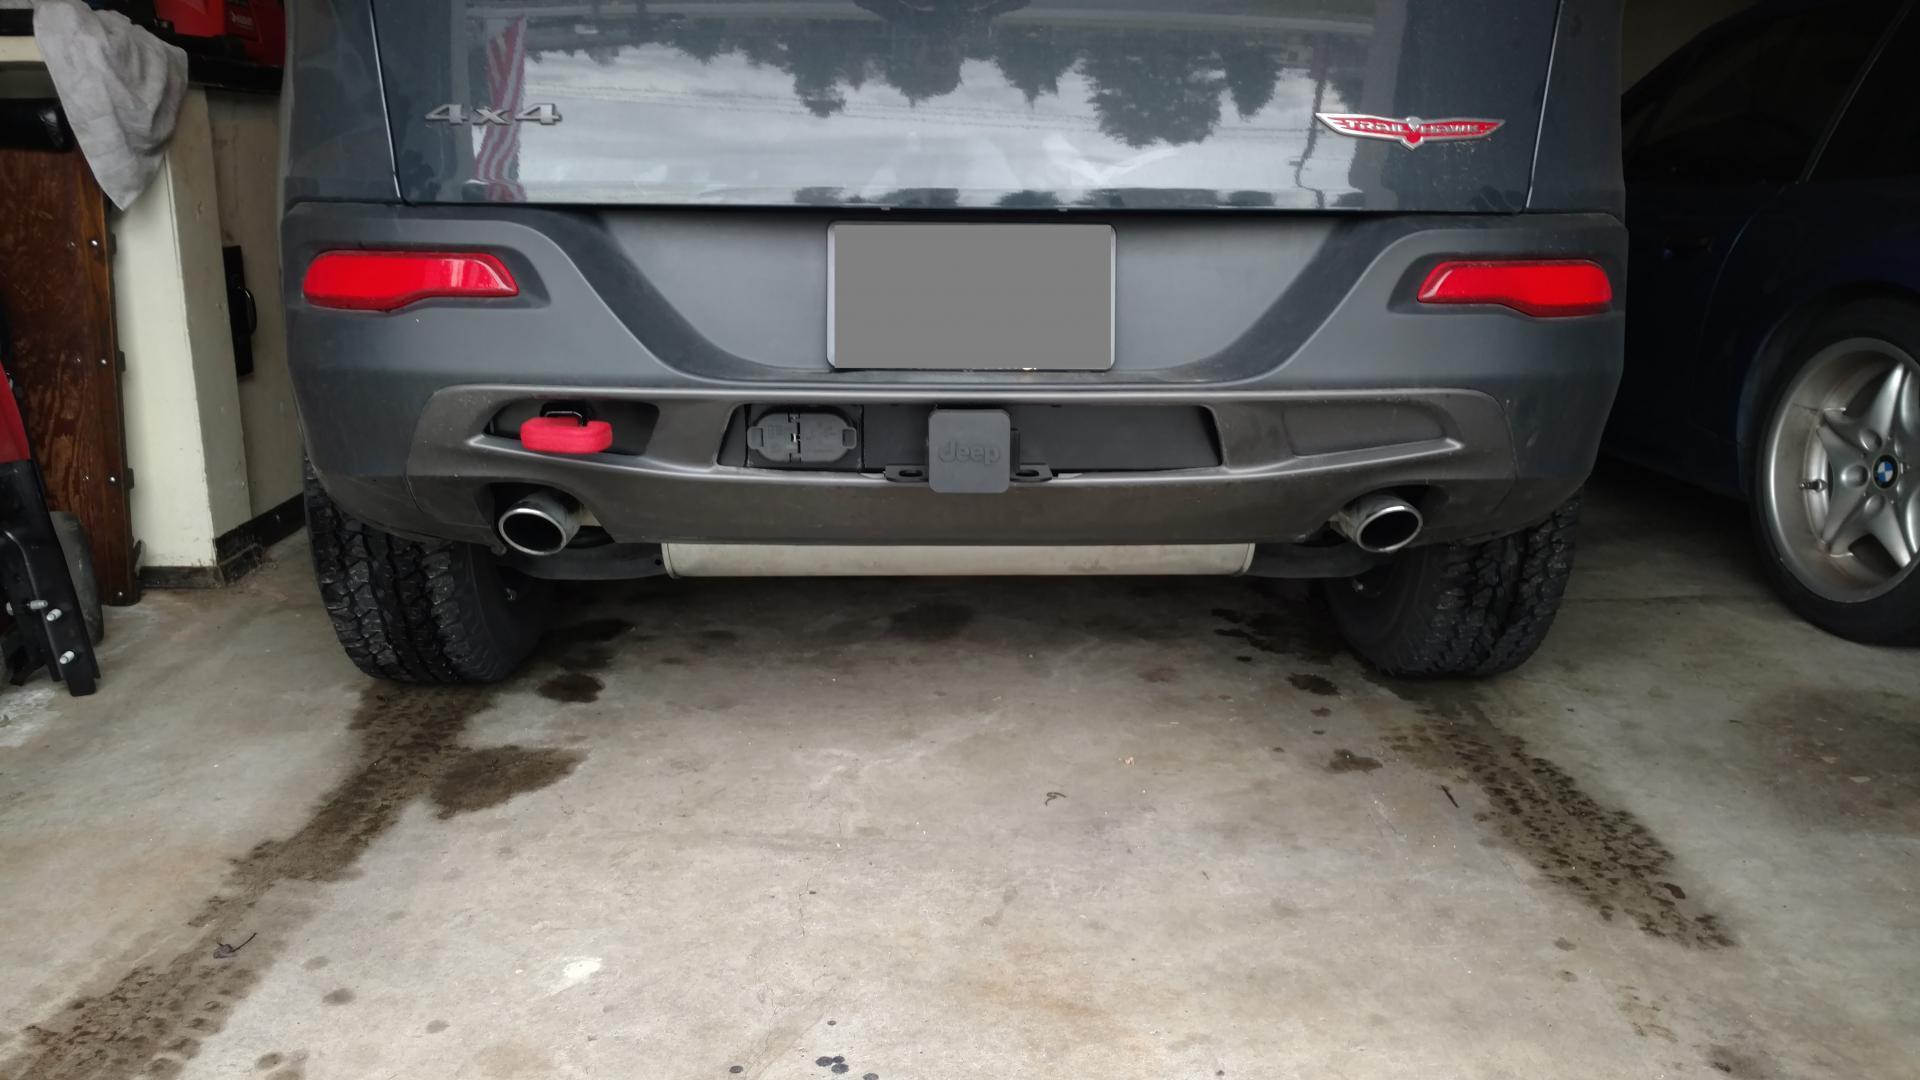 [DVZP_7254]   Mopar Receiver Hitch & Wiring Harness Installation | 2014+ Jeep Cherokee  Forums | 2015 Jeep Cherokee Hitch Wiring Harness |  | Jeep Cherokee Forum